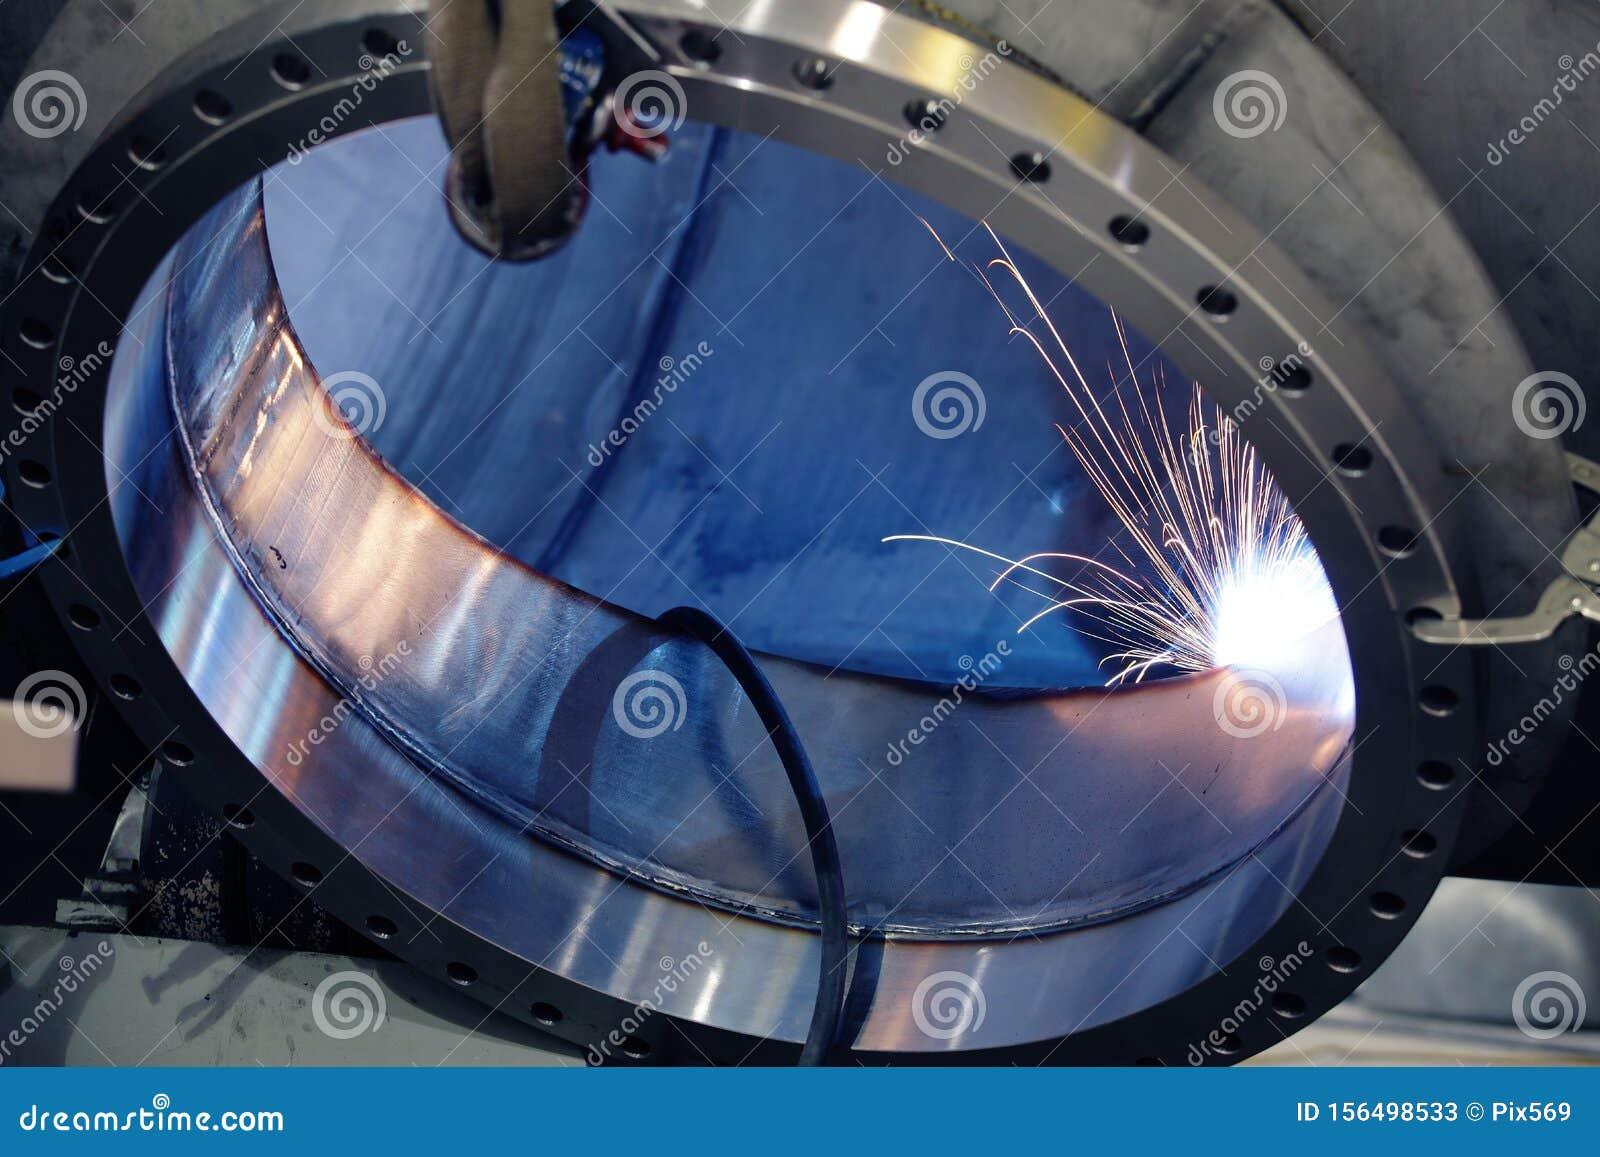 A welder welding a port onto a pressure vessel in a metal fabrication shop.